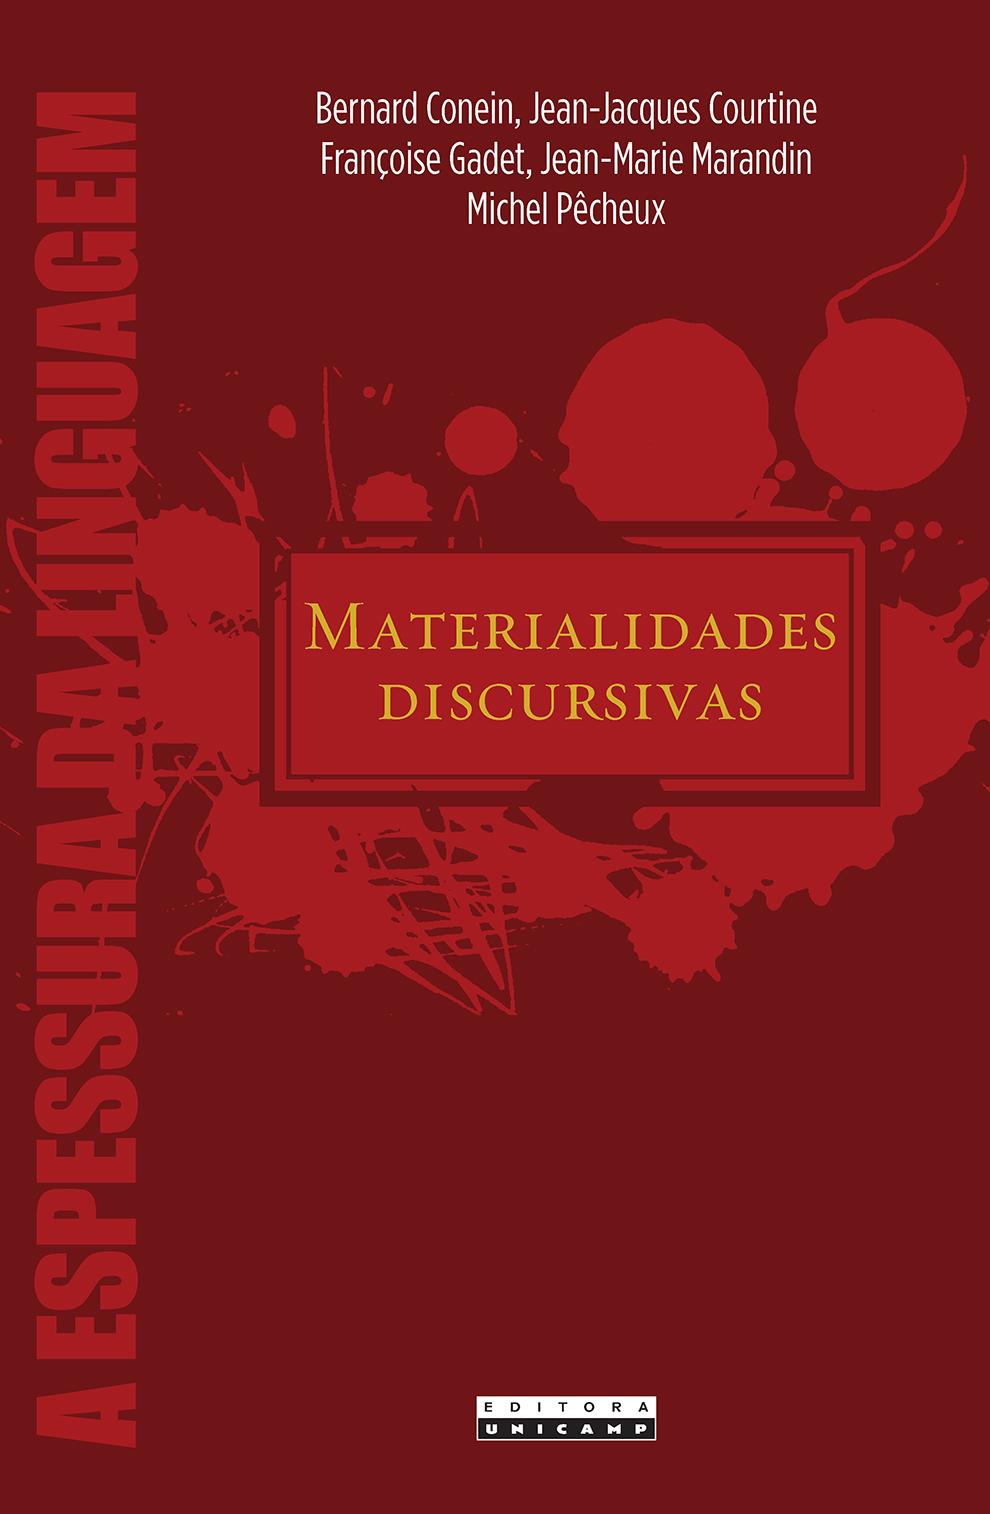 Materialidades discursivas, livro de Bernard Conein, Jean-Jacques Courtine, Françoise Gadet, Jean-Marie Marandin, Michel Pêcheux (org.)